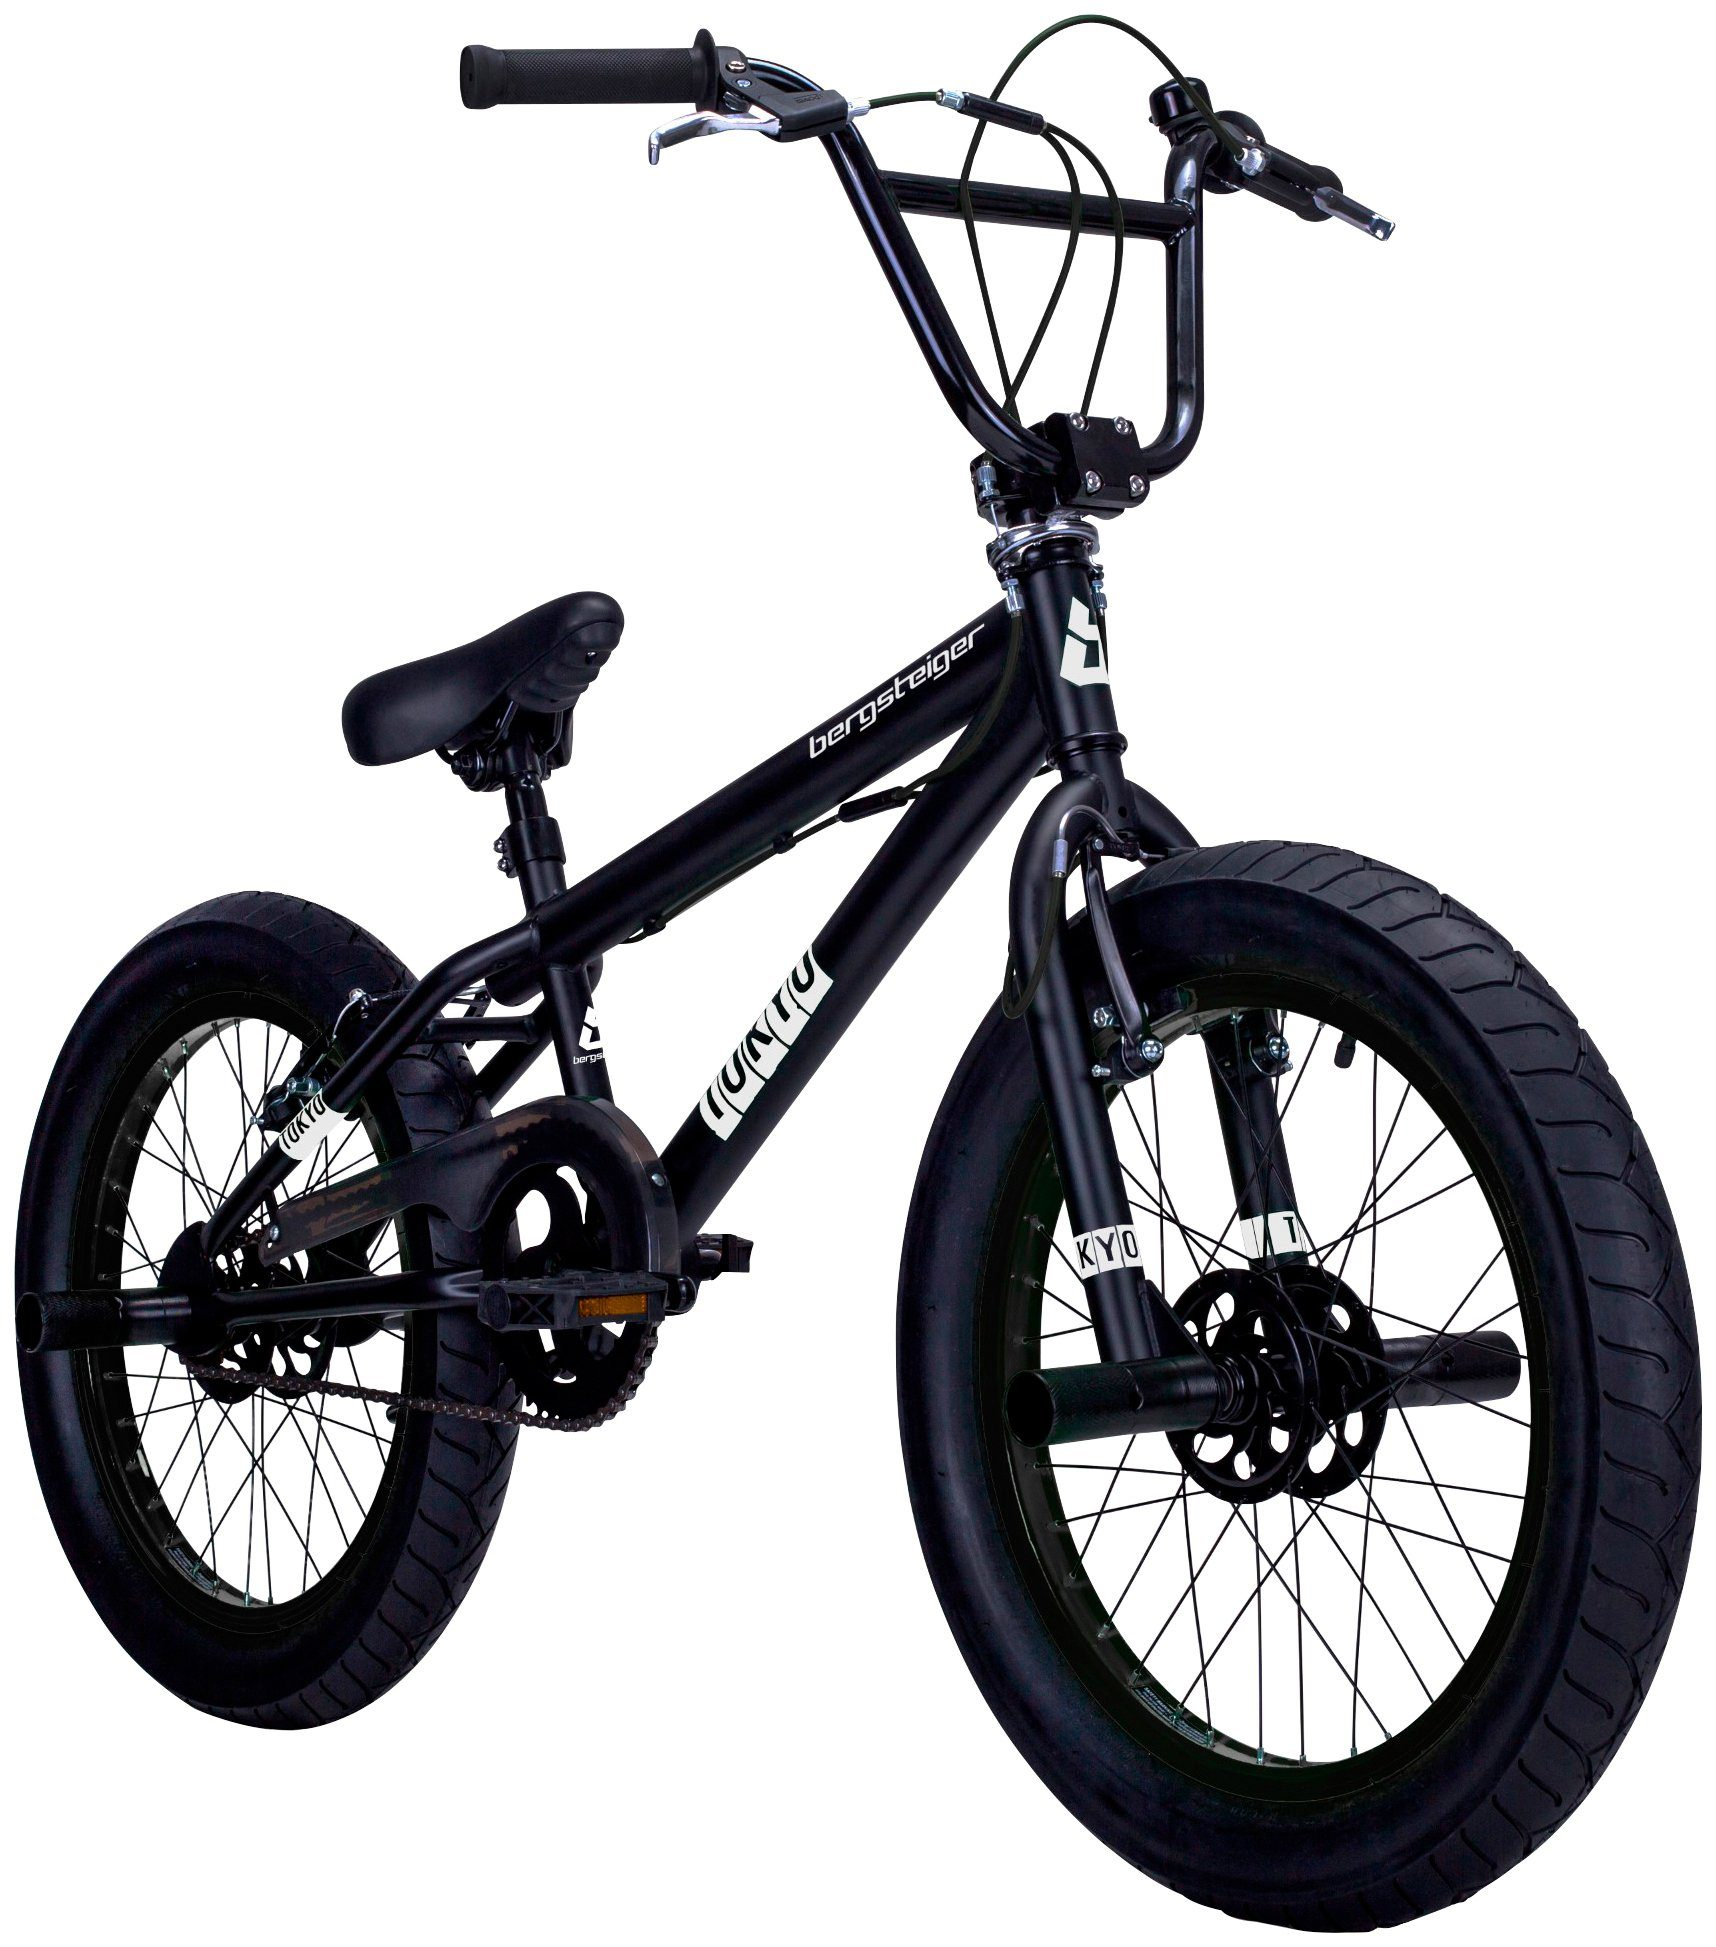 Bergsteiger BMX »Tokyo«, 20 Zoll, 1 Gang, V-Bremsen